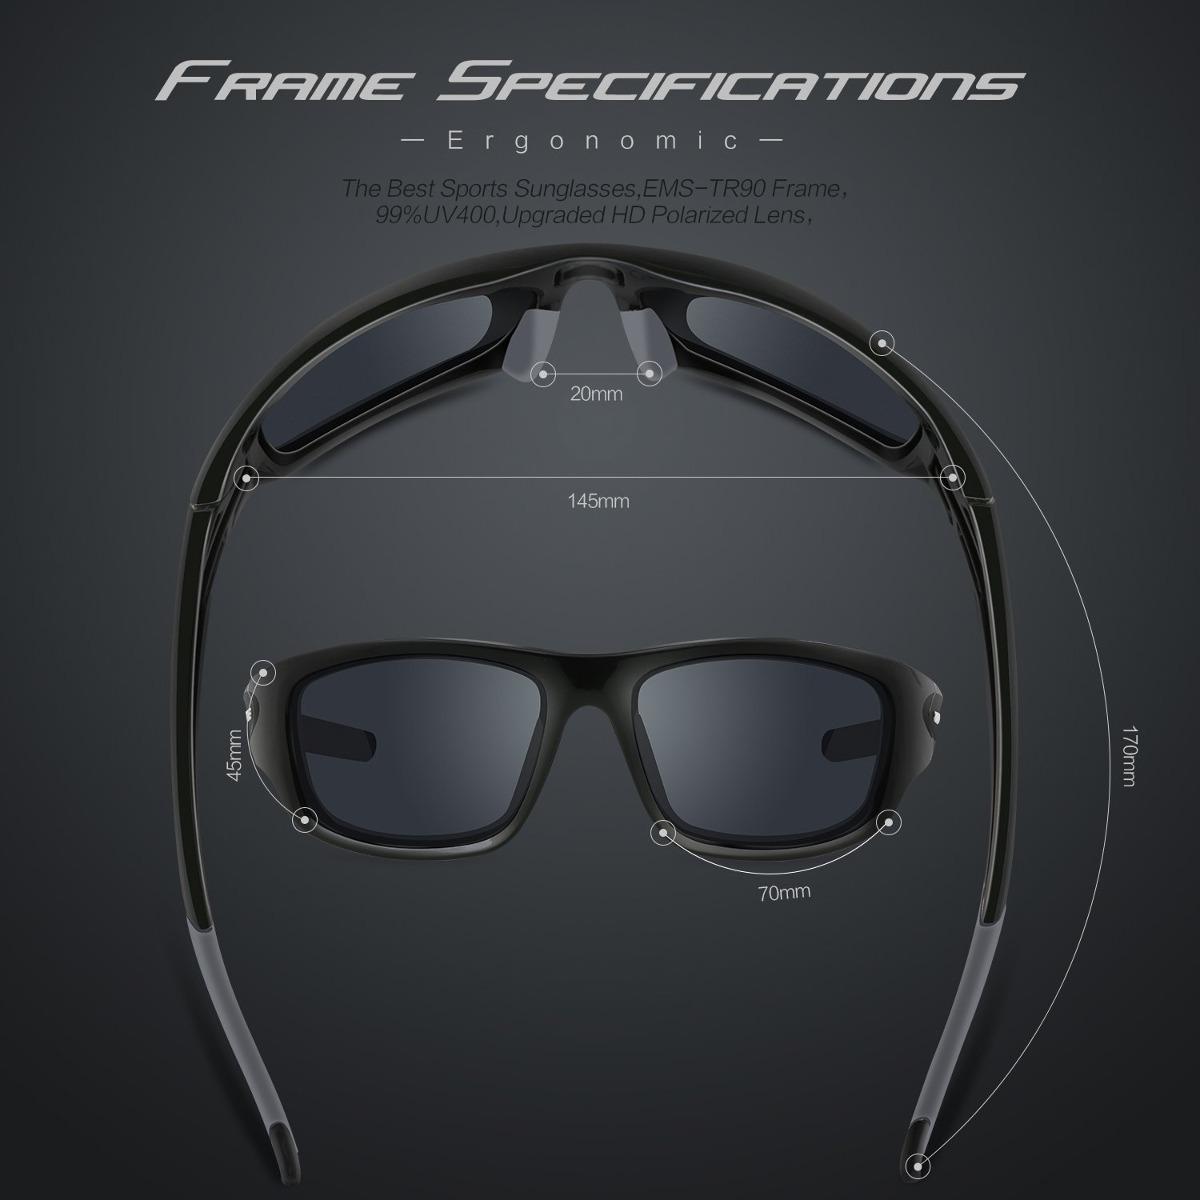 7a46e18879 torege polarized sports sunglasses para hombre mujeres ci. Cargando zoom.